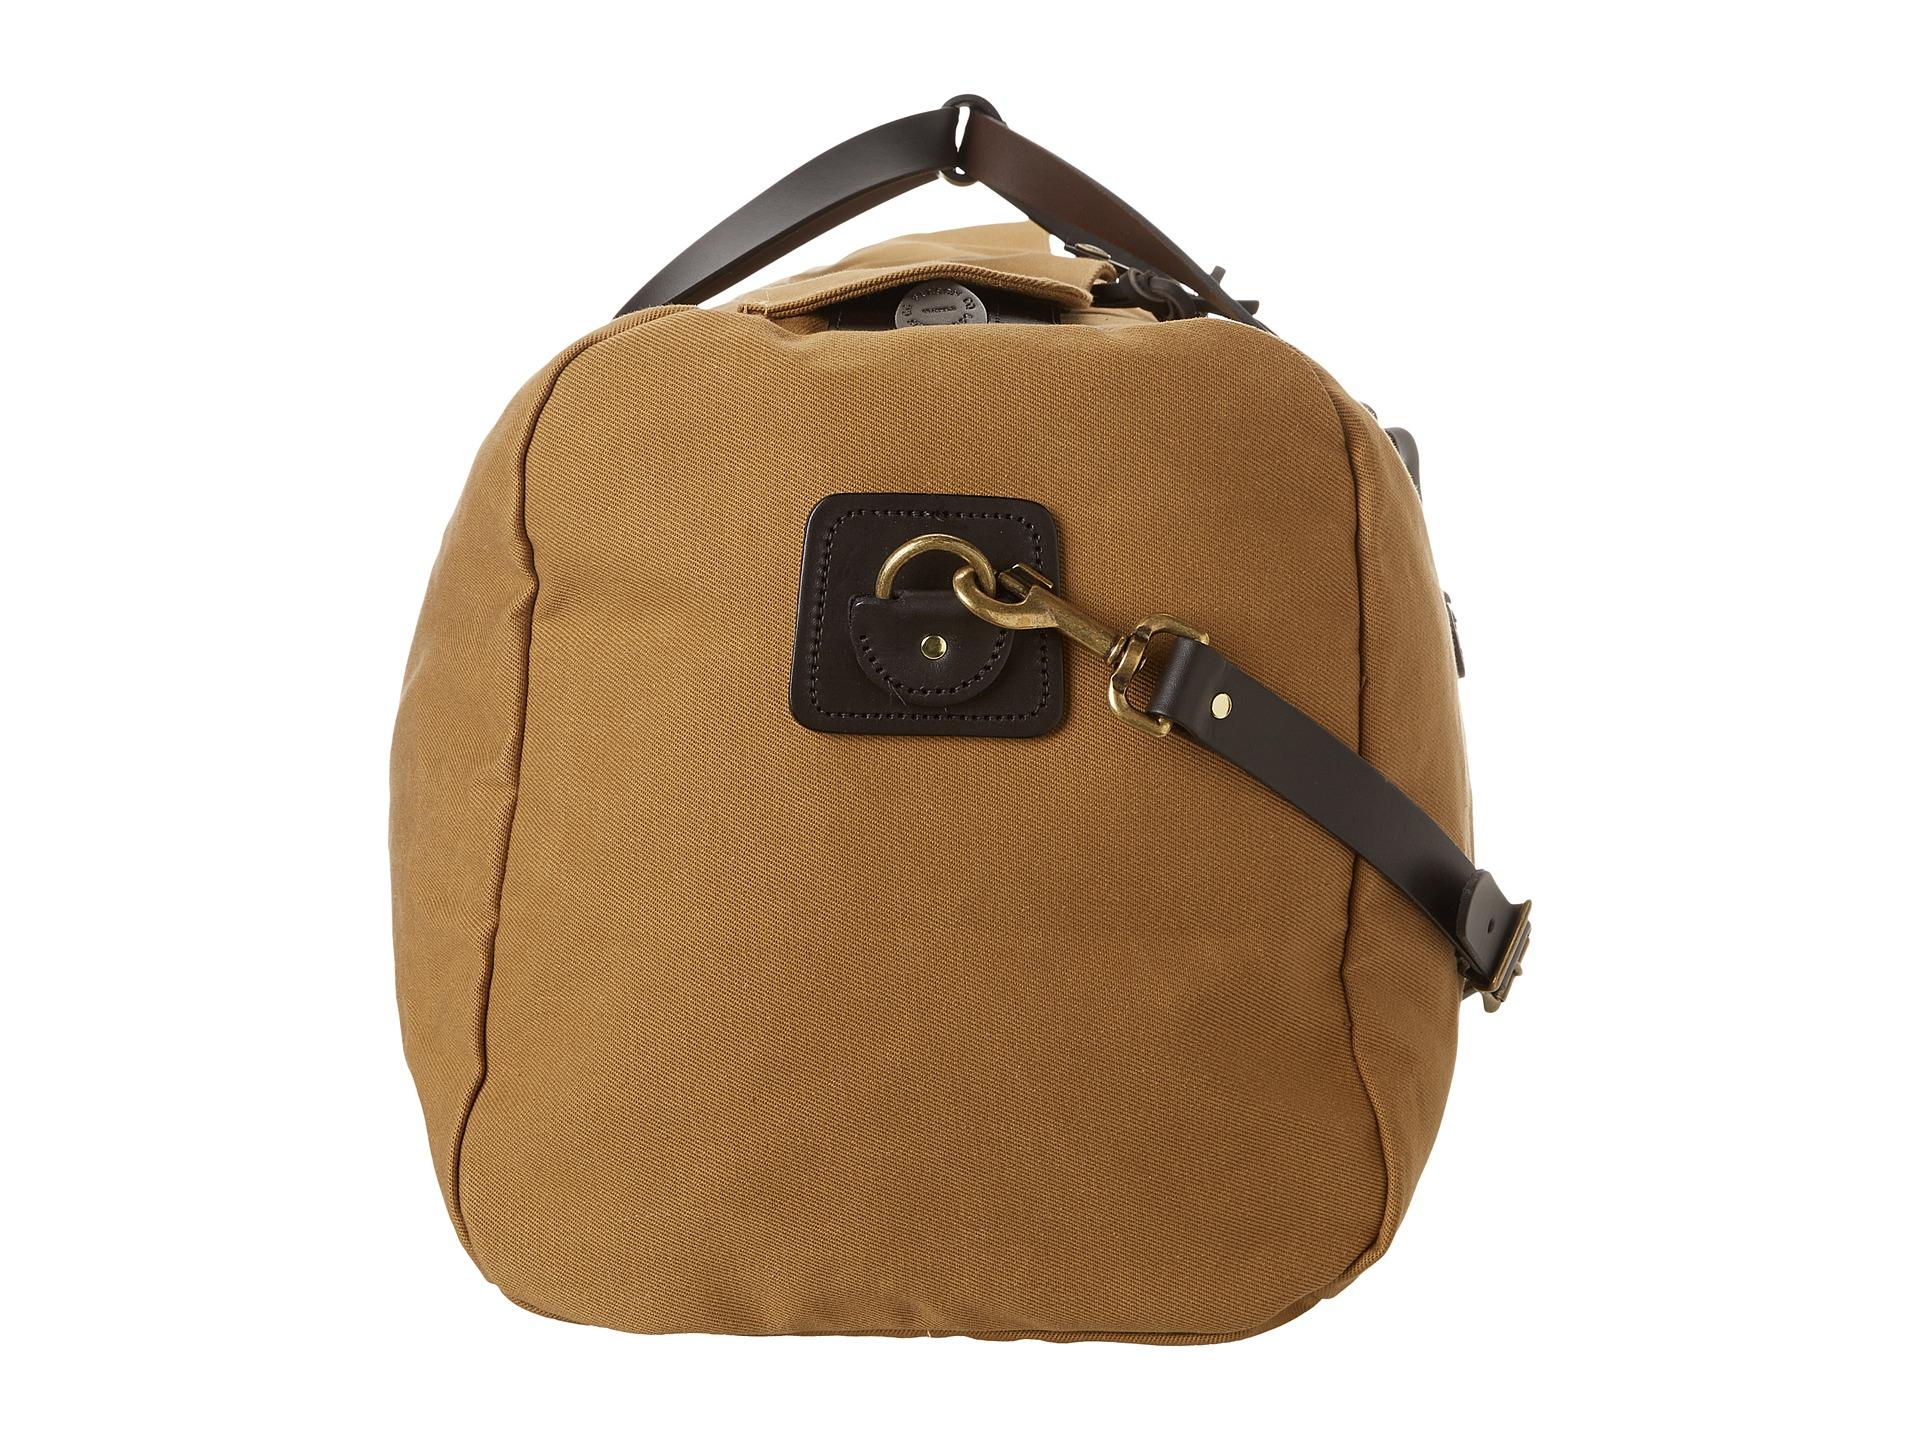 filson large duffle bag zappos free shipping both ways